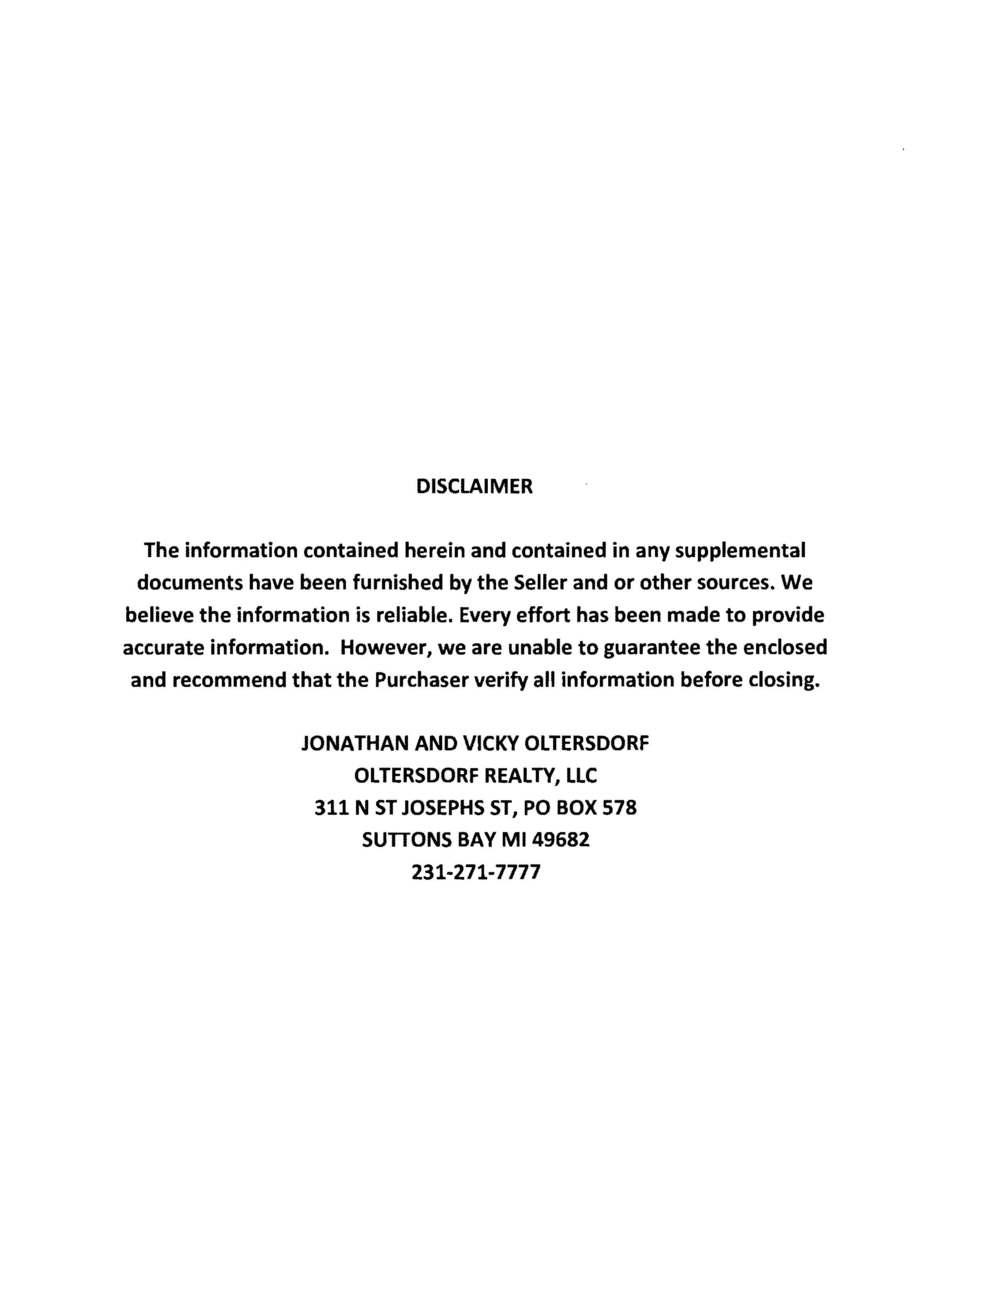 2736 S Lake Leelanau Dr, South Lake Leelanau Waterfront for sale by Oltersdorf Realty LLC - Marketing Packet (37).jpg